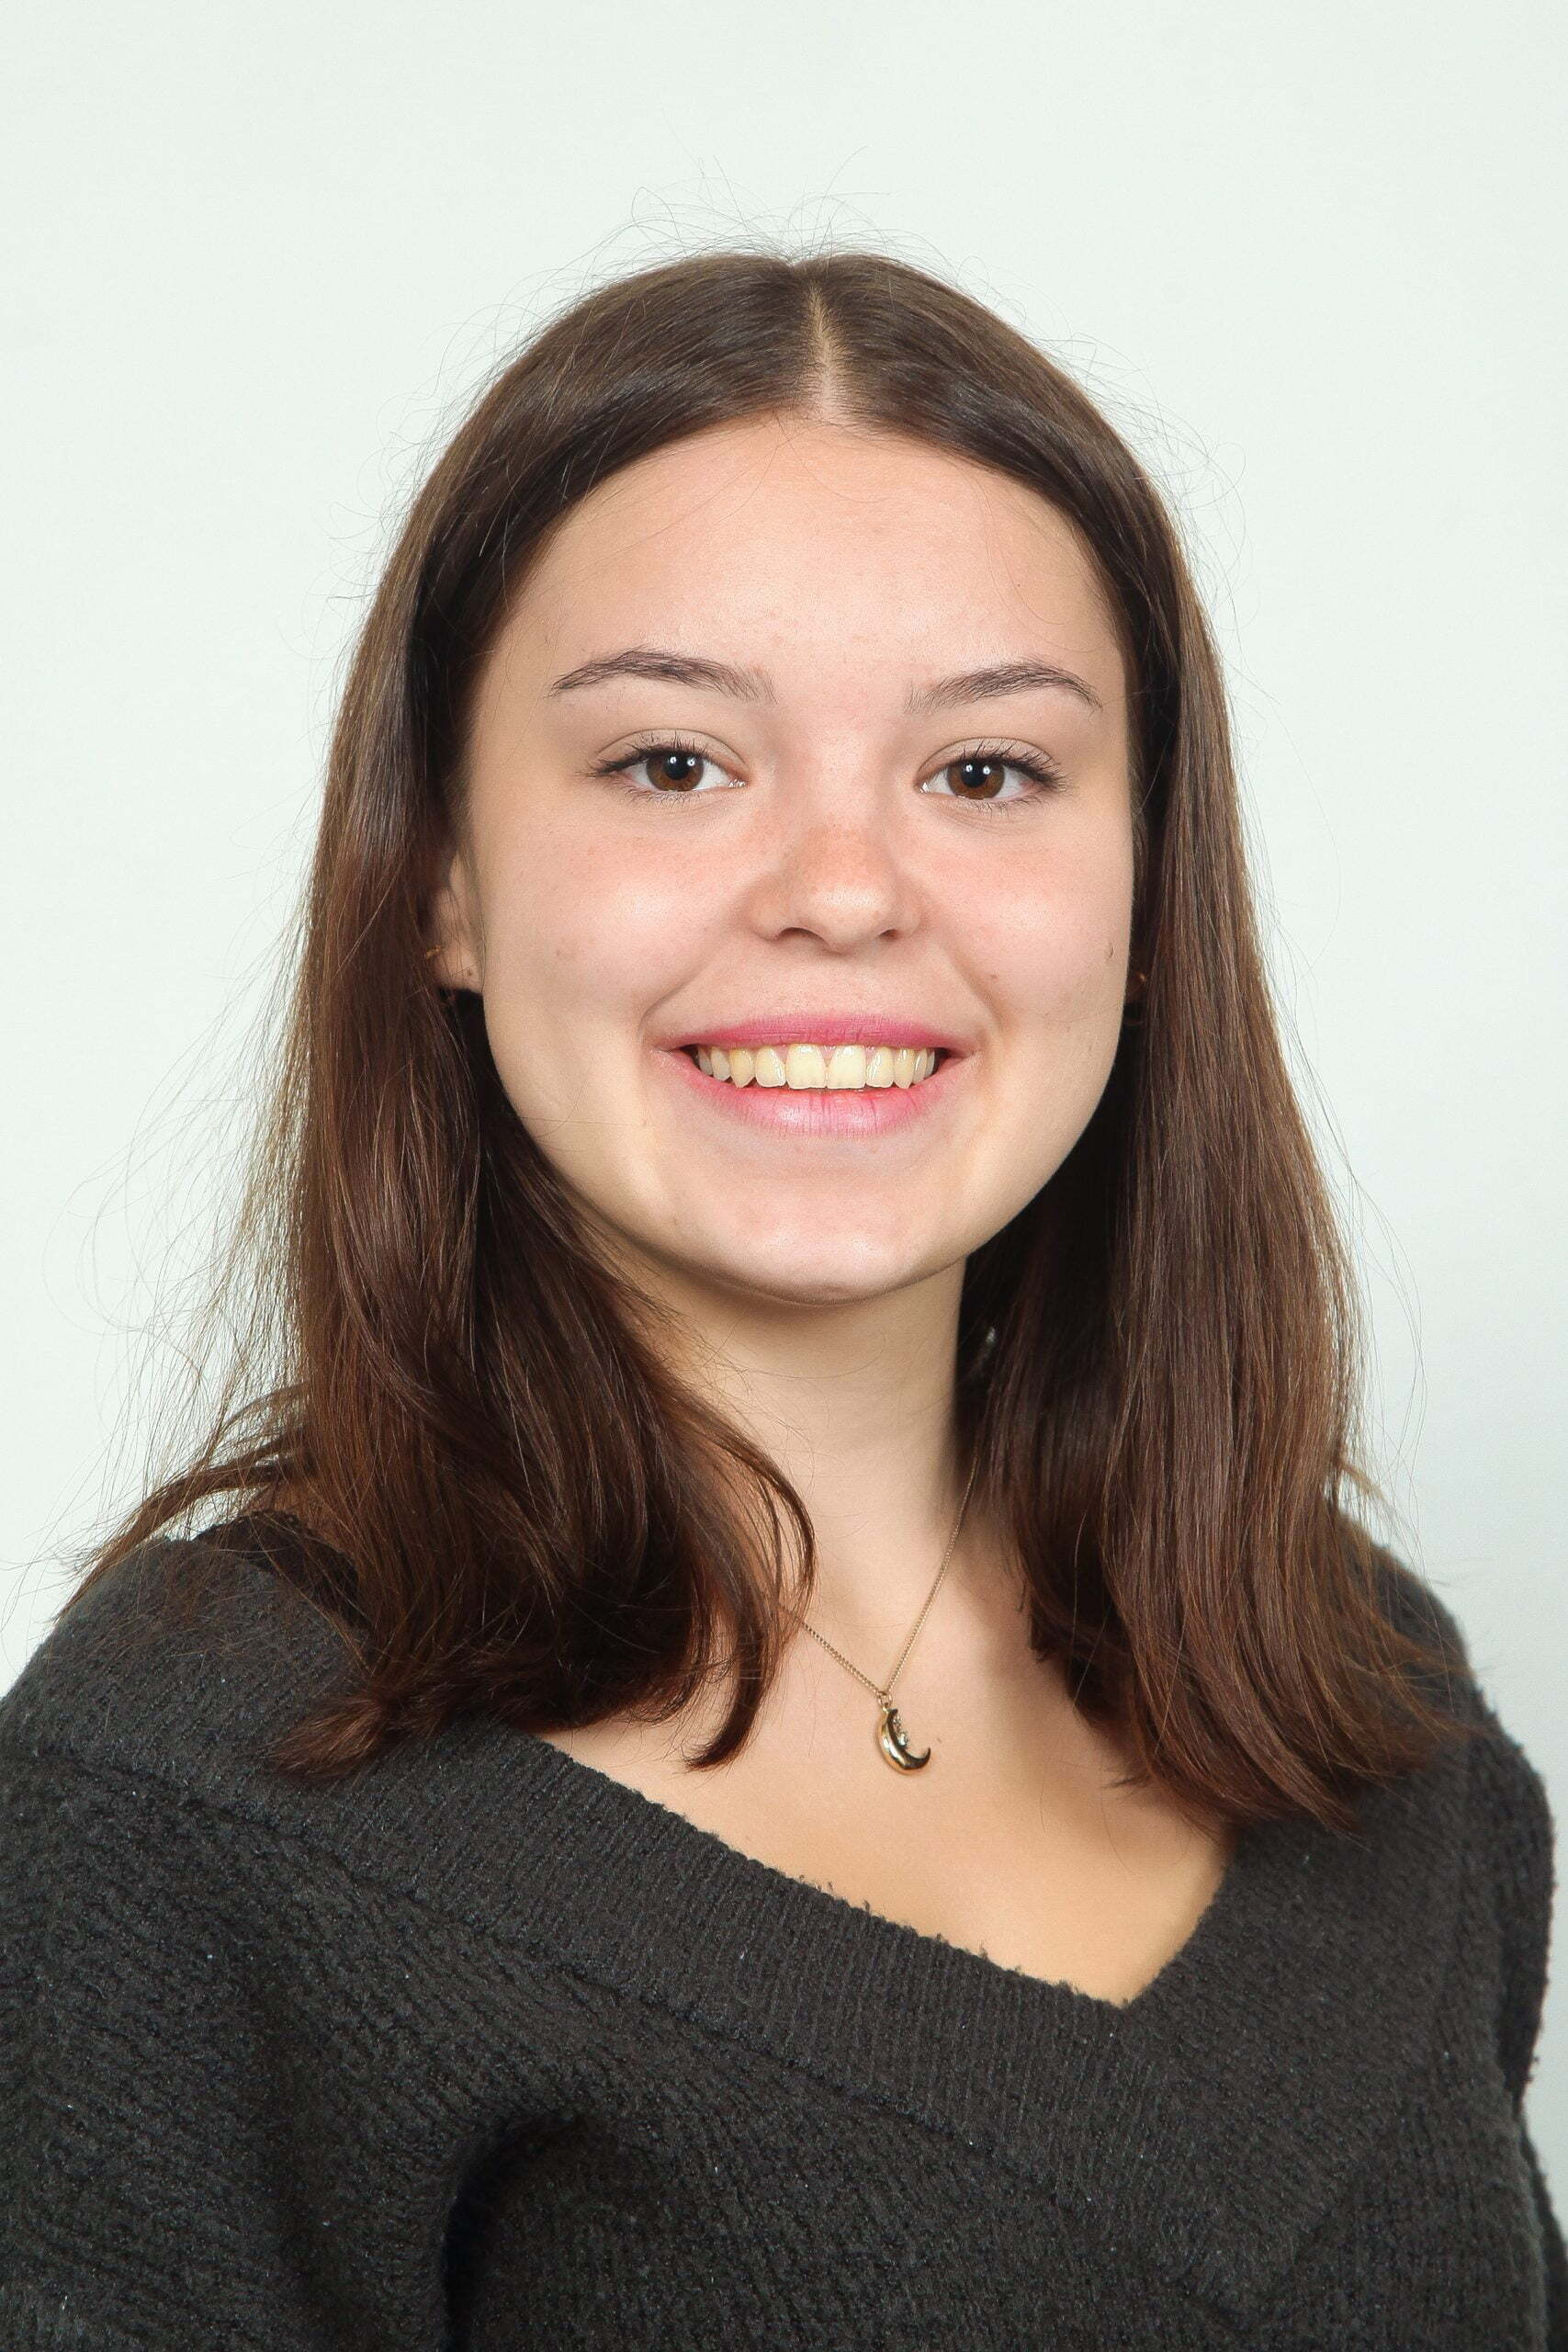 Pia Schmidle